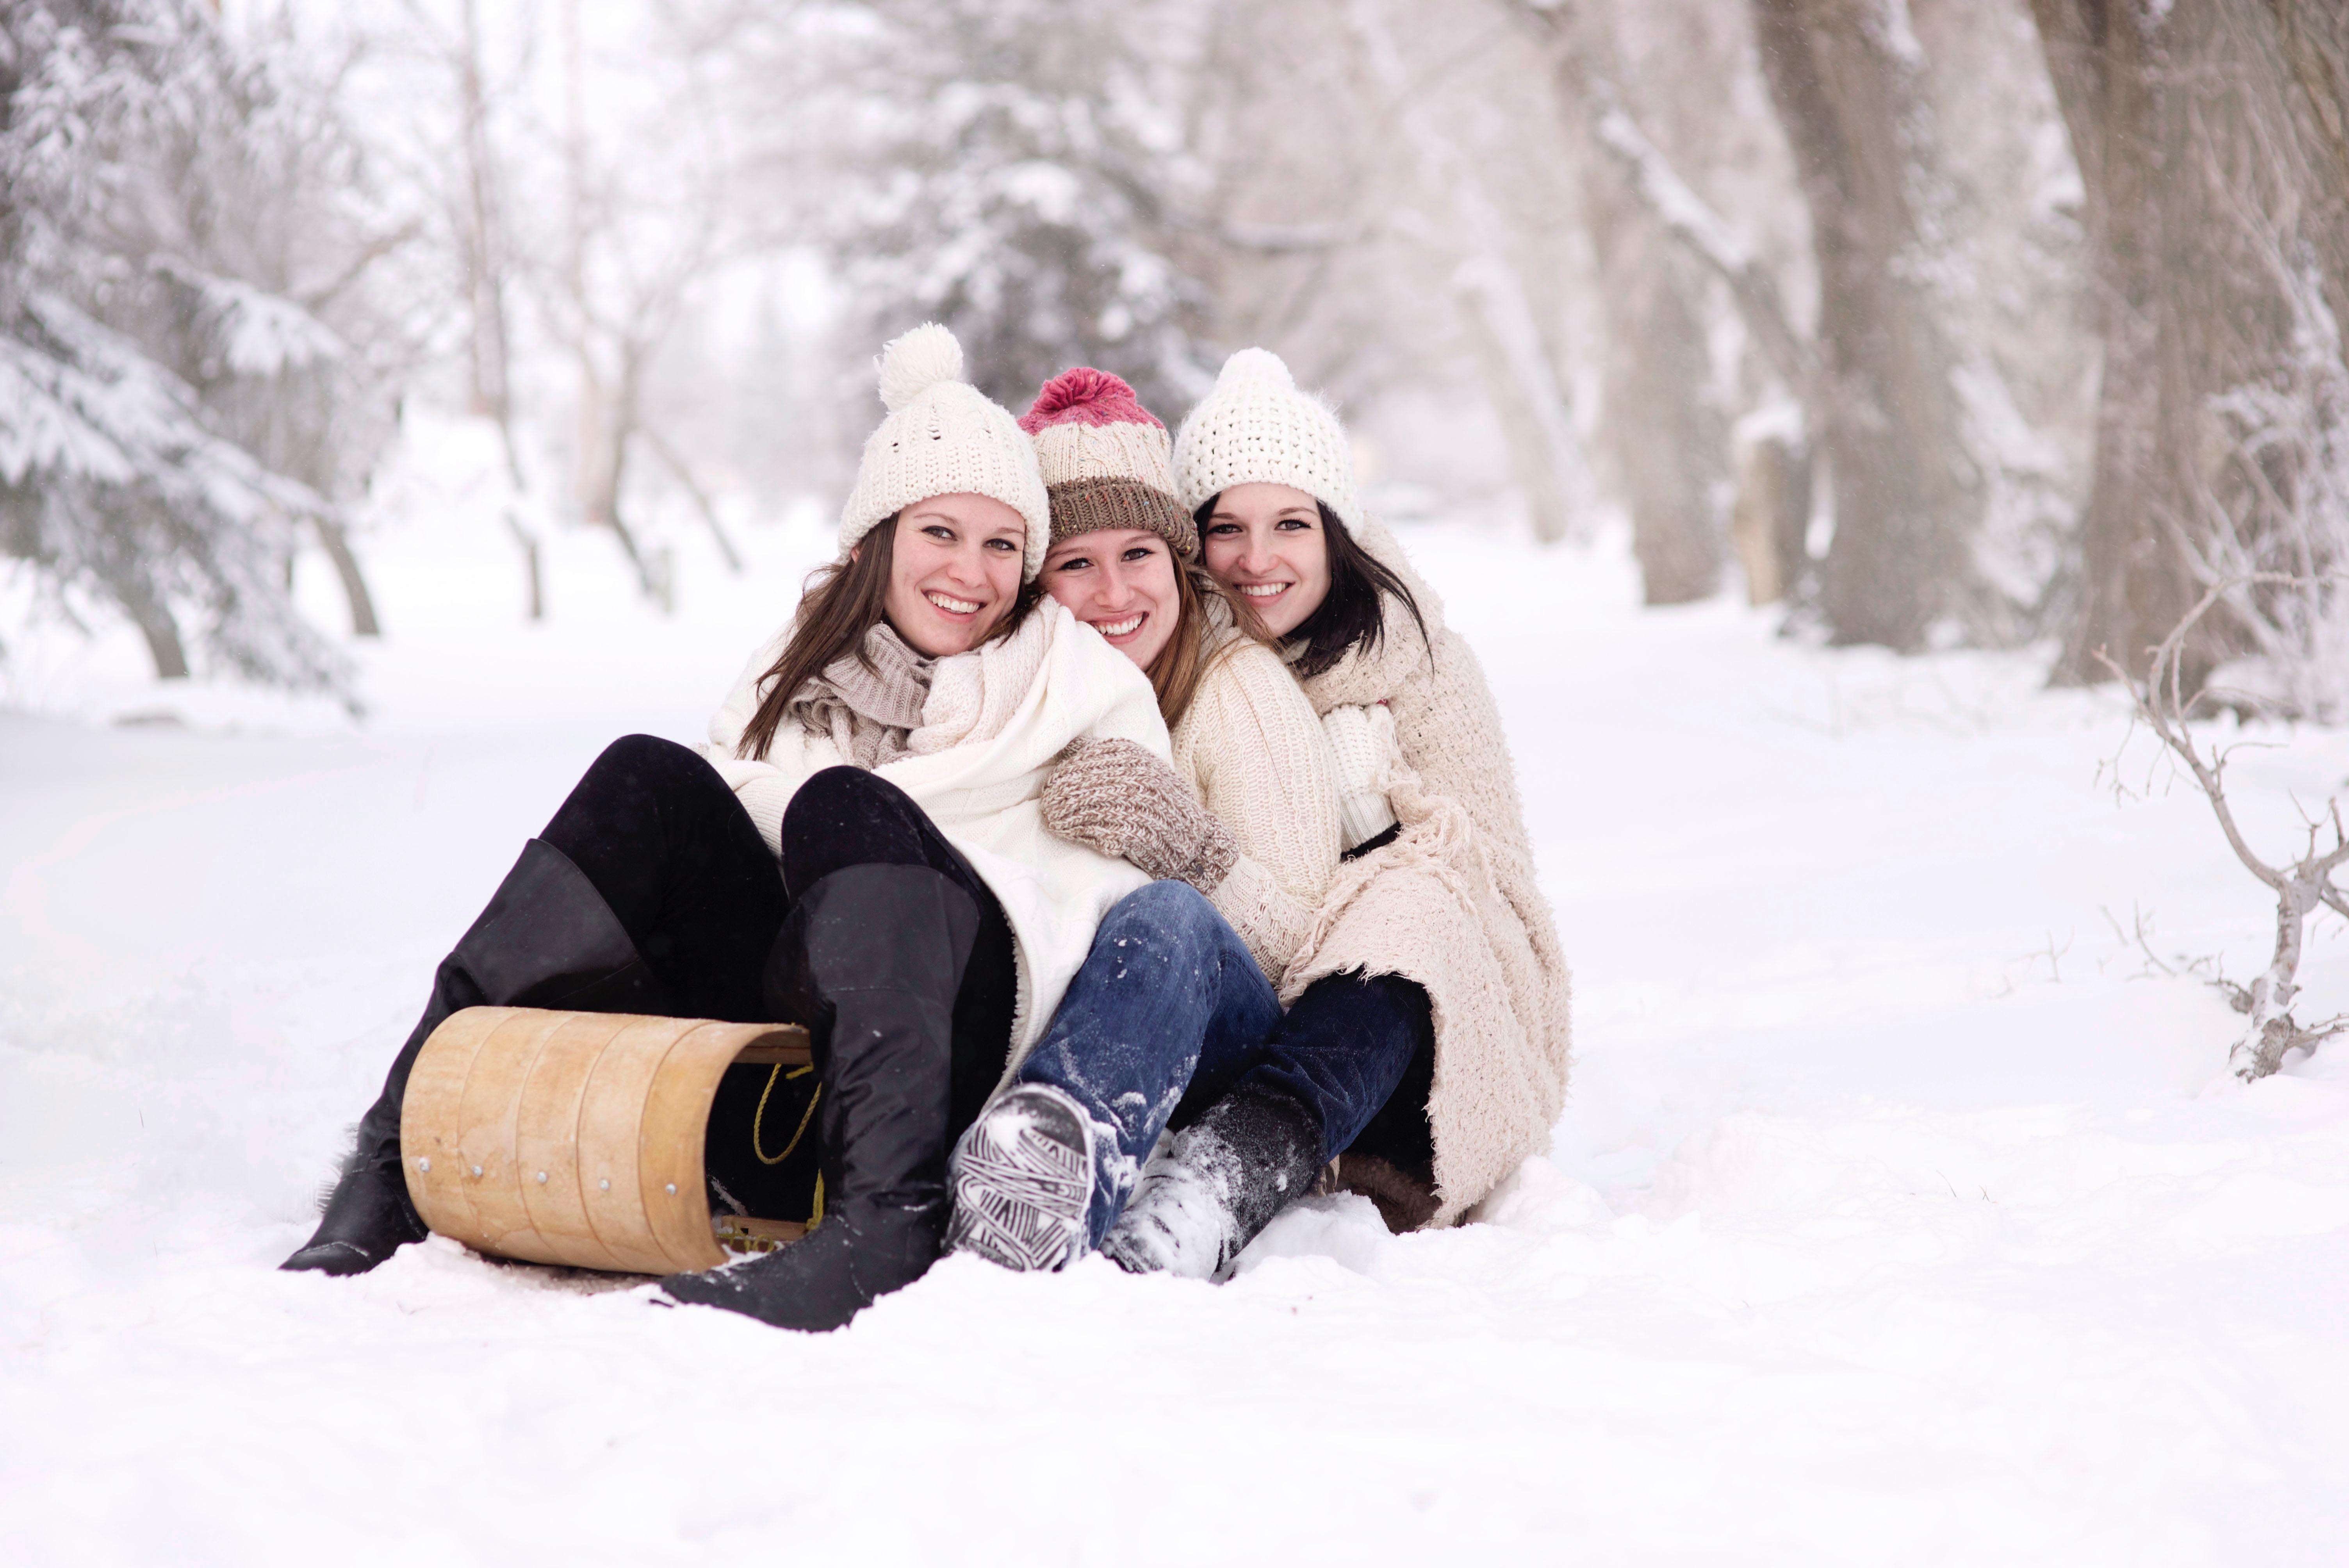 hiver joie depression